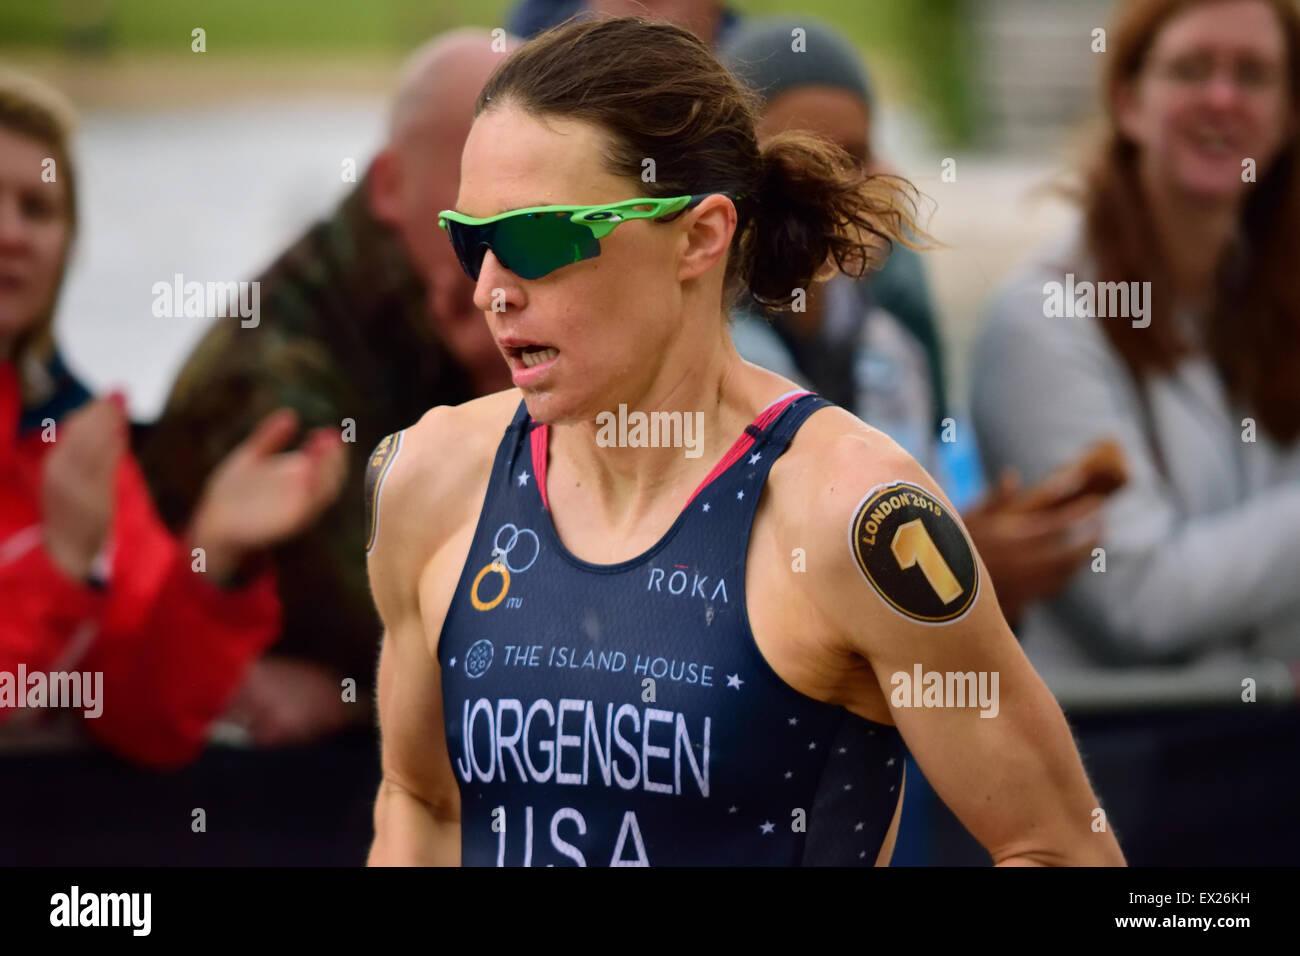 Gwen Jorgensen running in a race Stock Photo